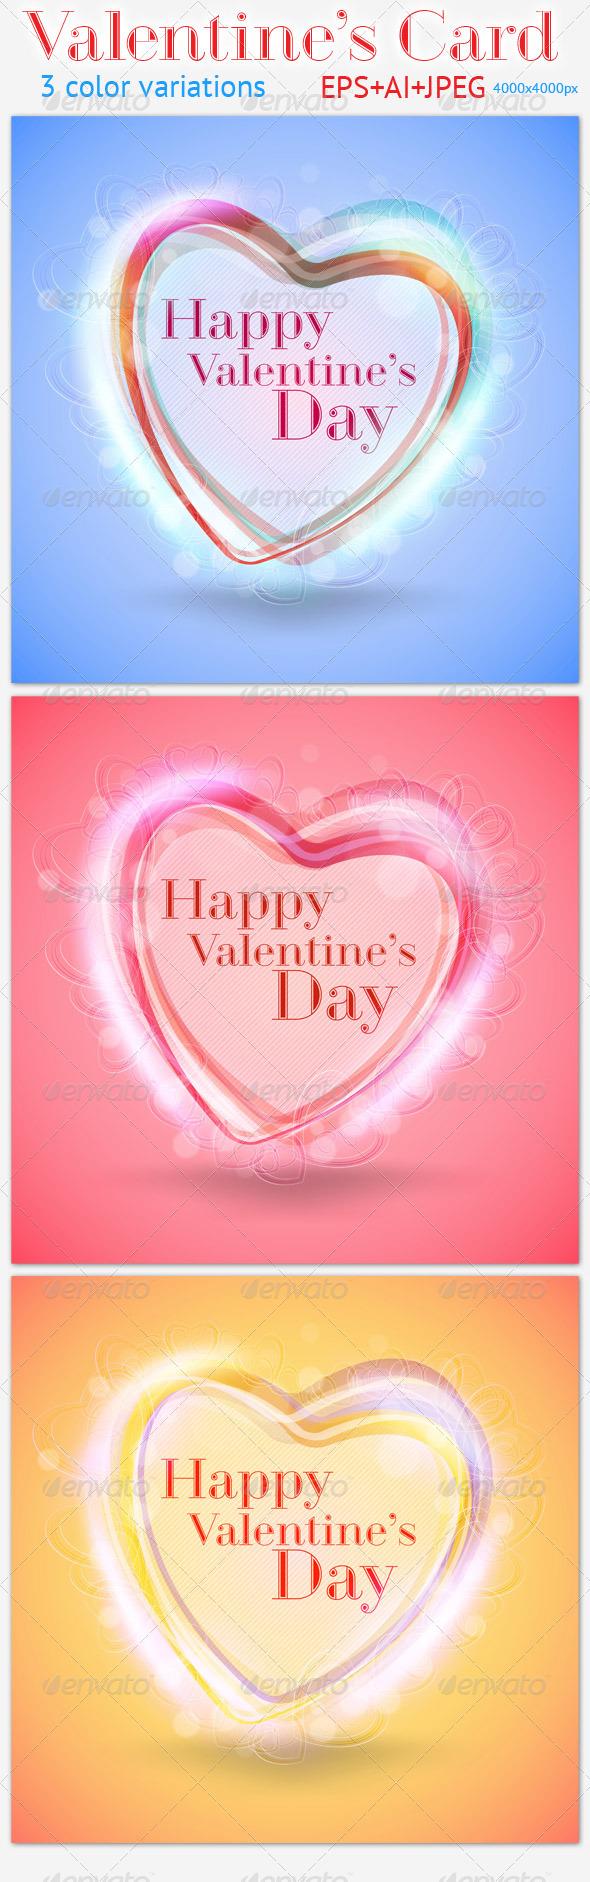 GraphicRiver Valentine s Card 3755702